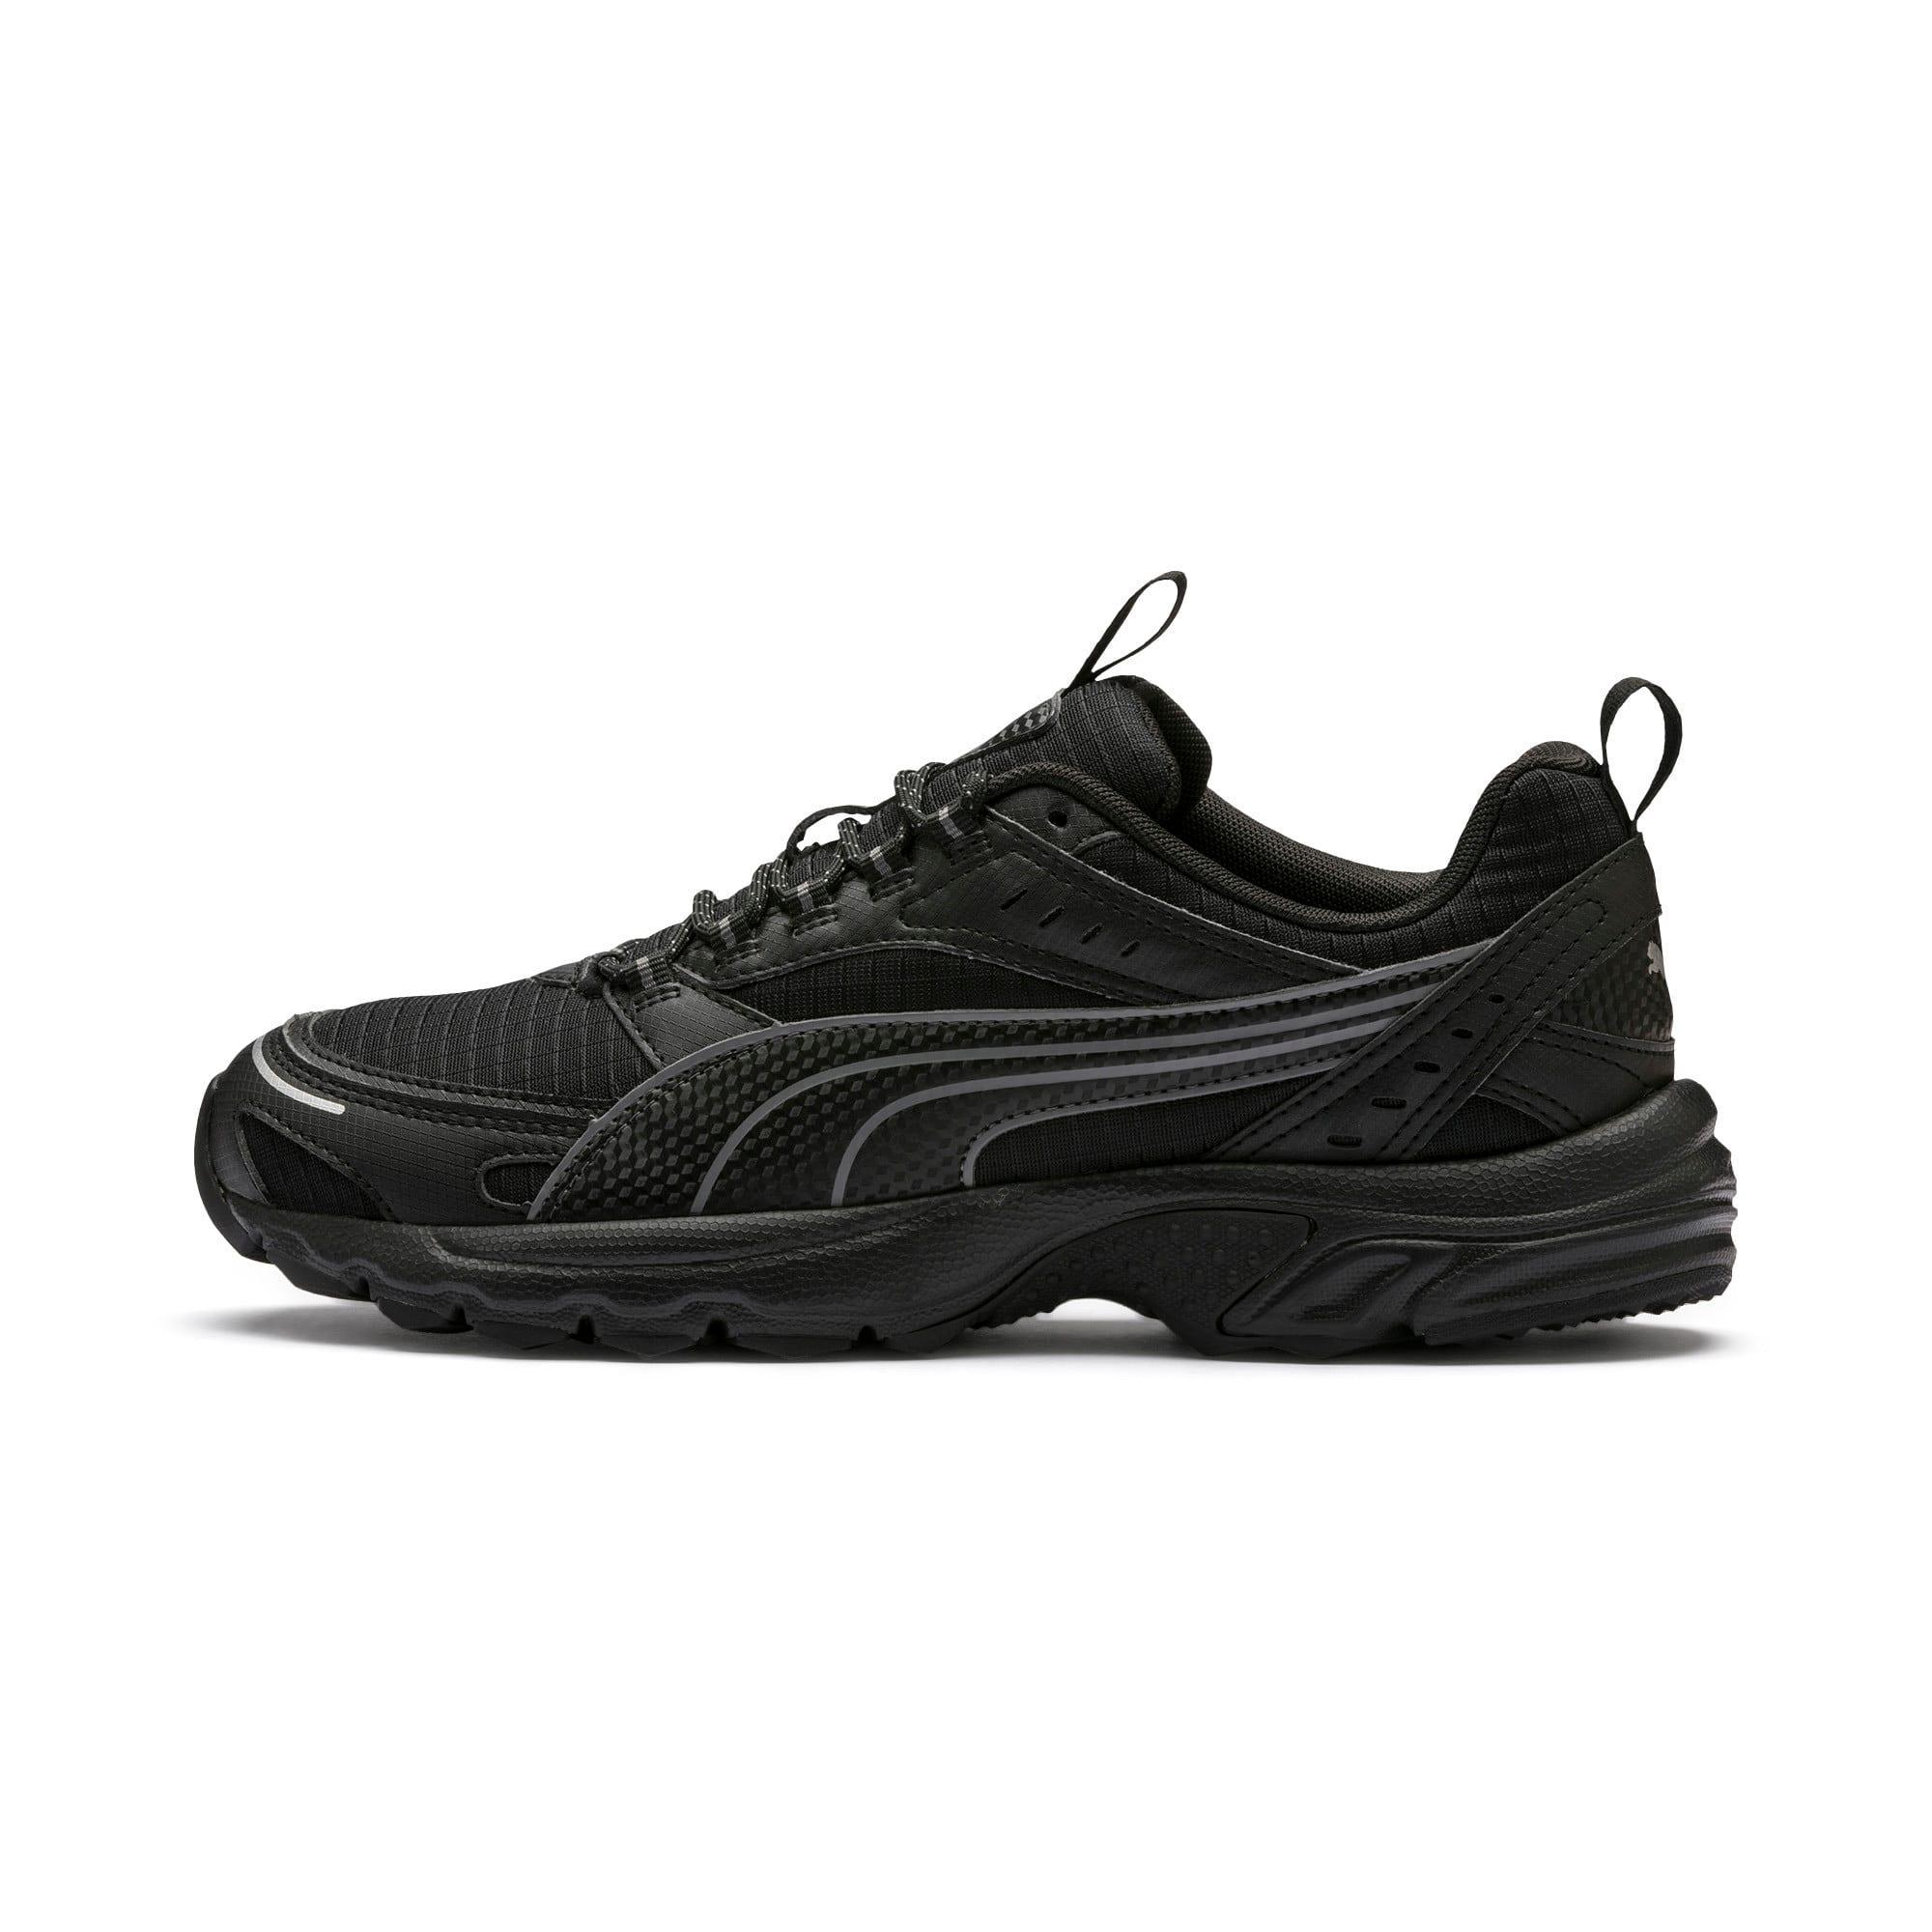 Thumbnail 1 of Axis Trail Sneakers, Puma Black-CASTLEROCK-Silver, medium